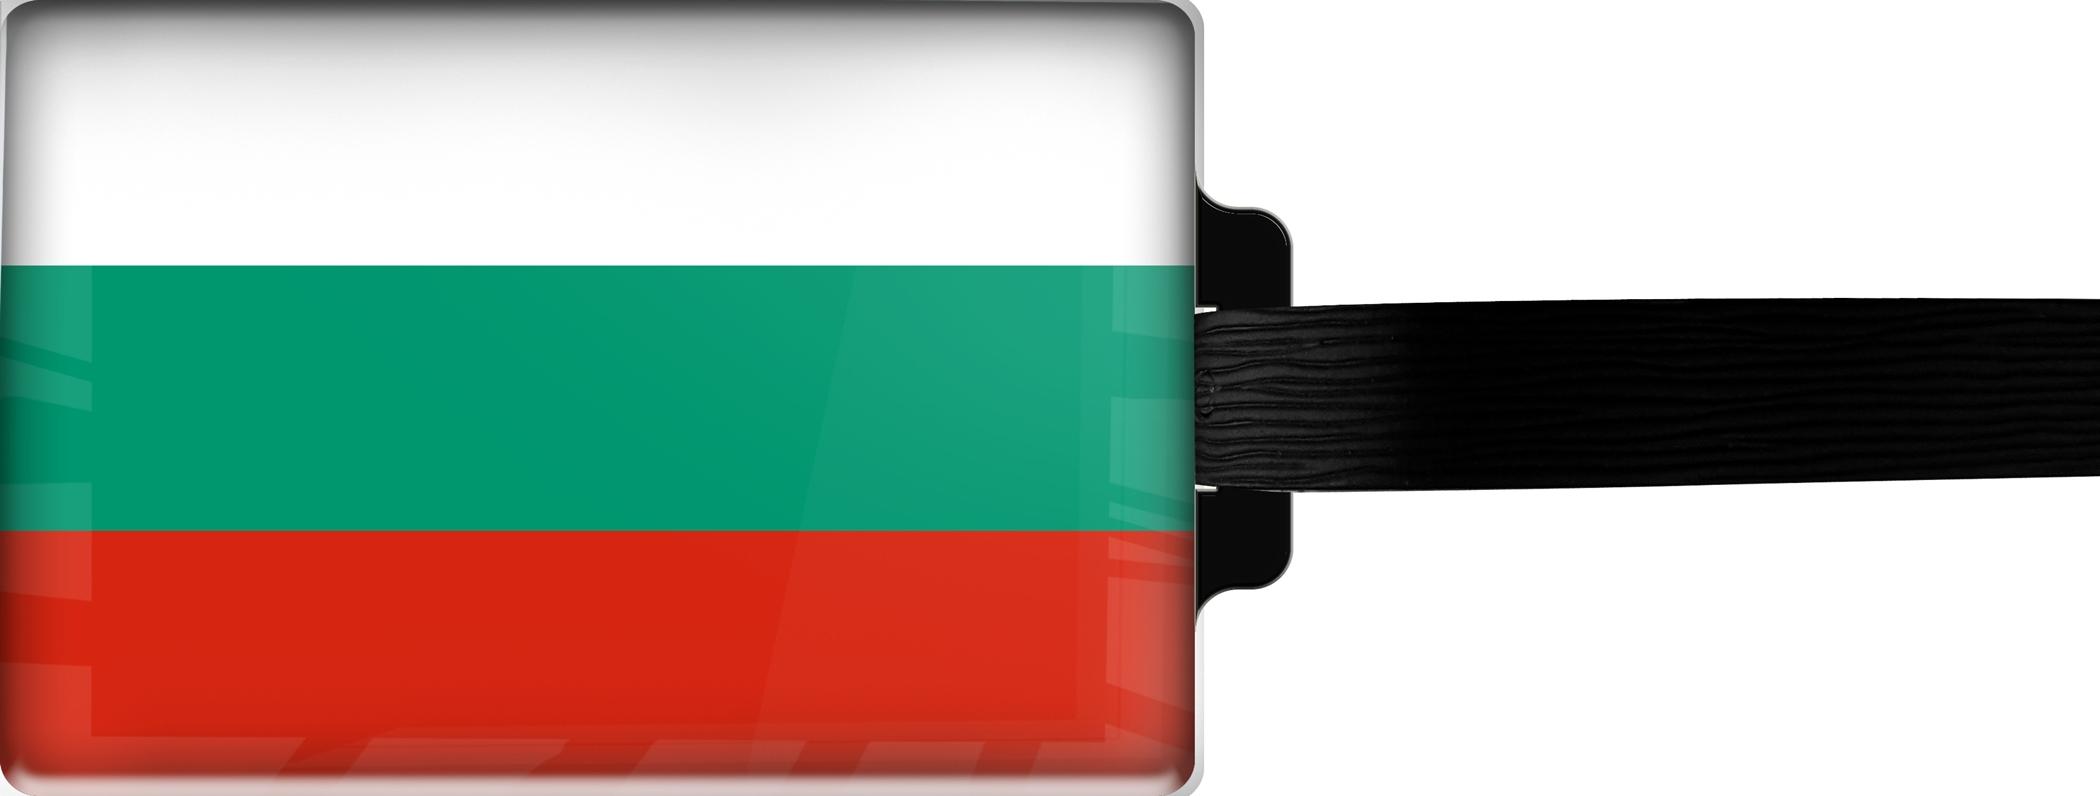 Hochwertiger Gepäckanhänger aus Acrylglas | FLAGGE BULGARIEN | metALUm #00084